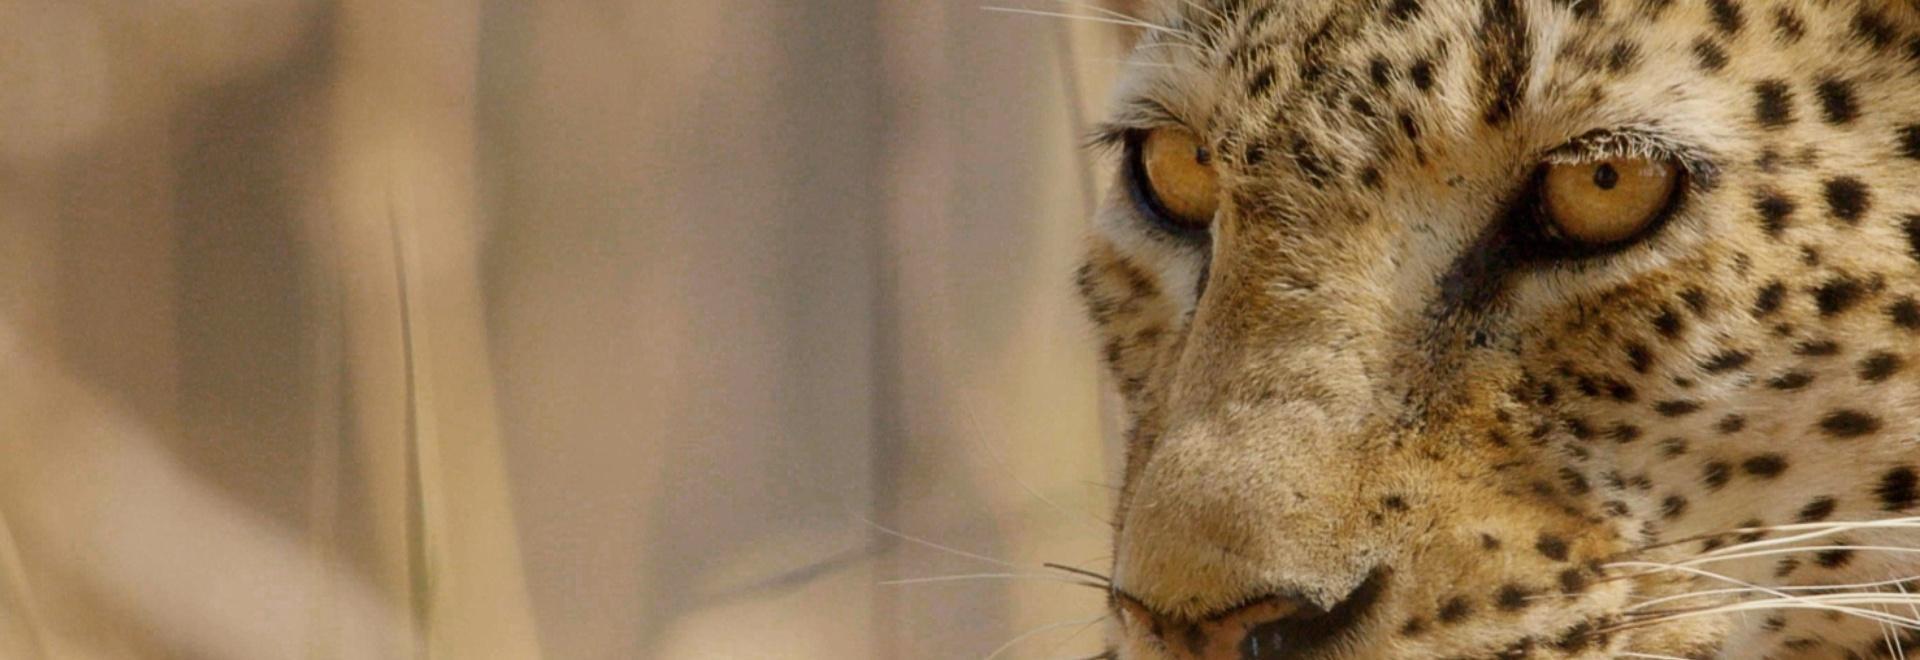 La carestia del leopardo